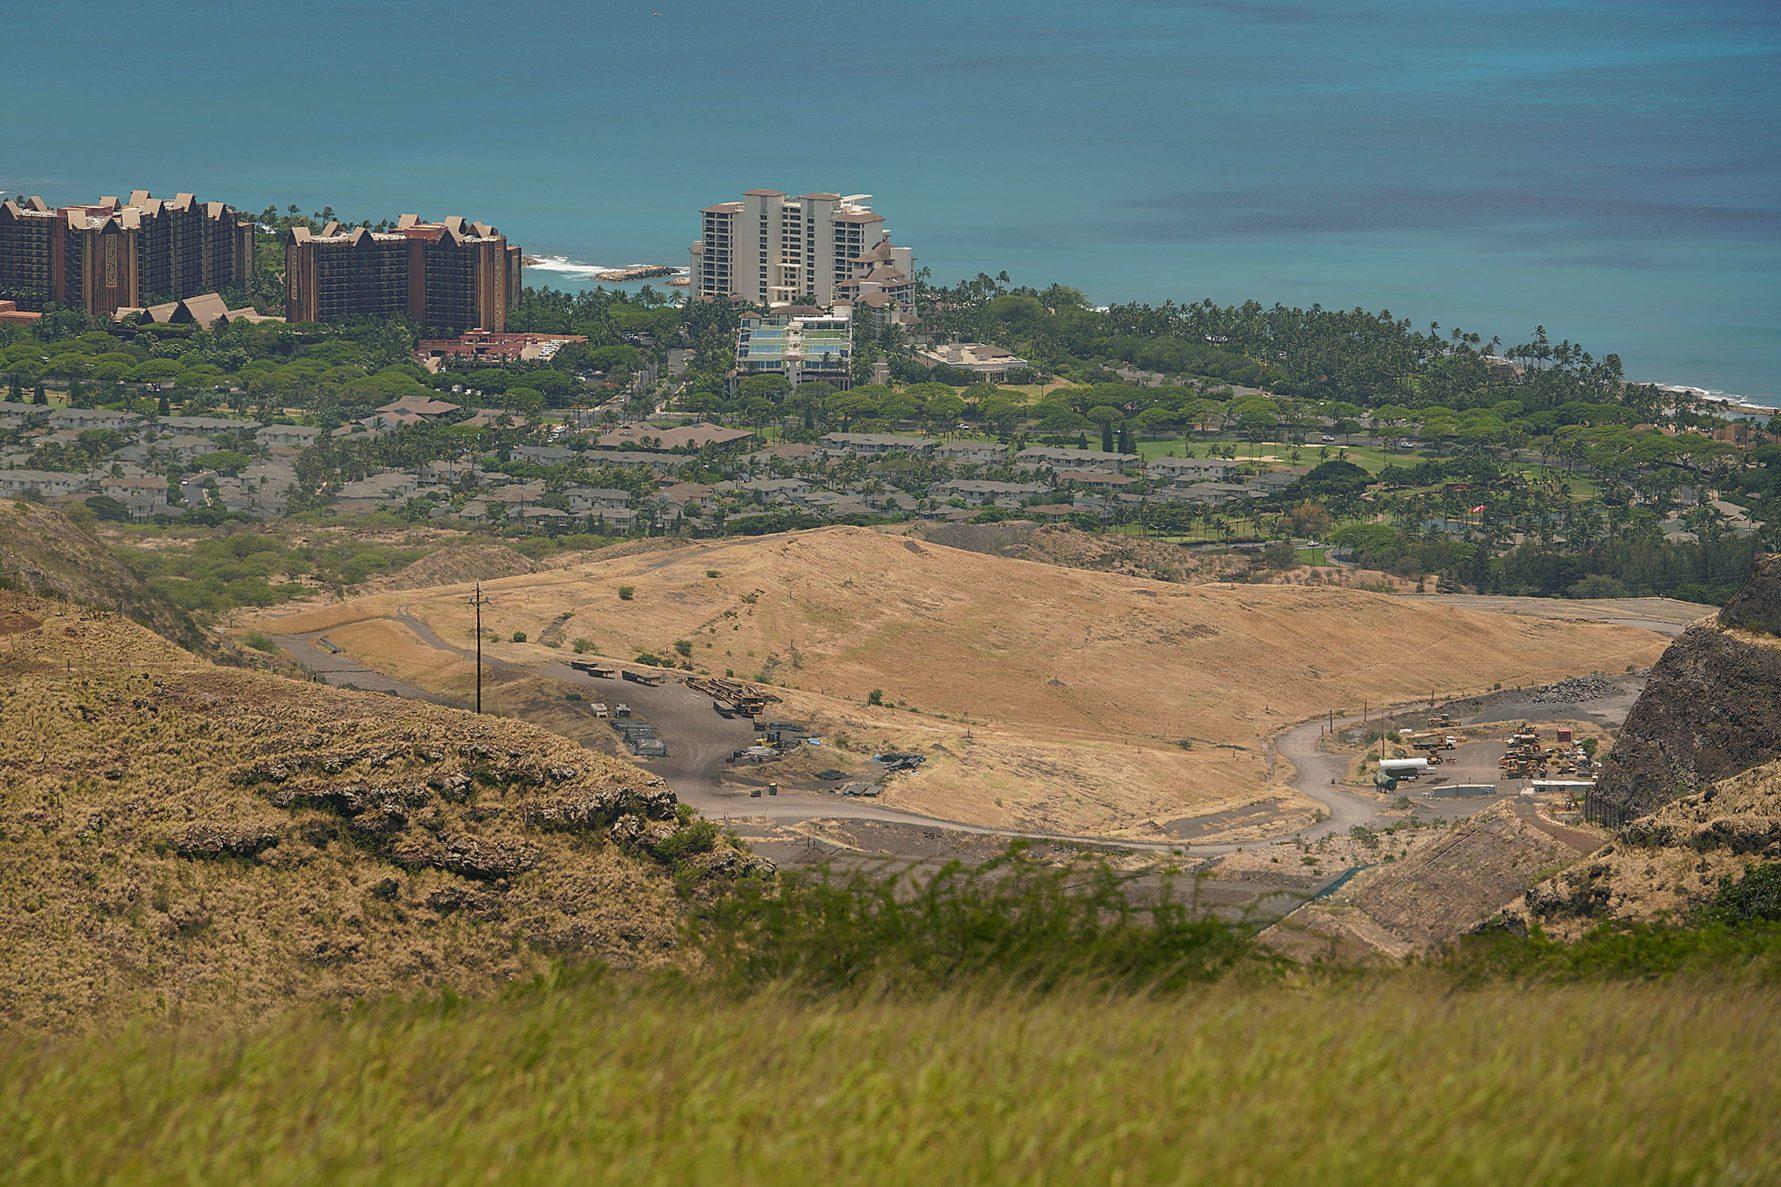 Waimanalo Gulch Waste Management Landfill located mauka of Disney Aulani and Koolina Ihilani. Waianae.